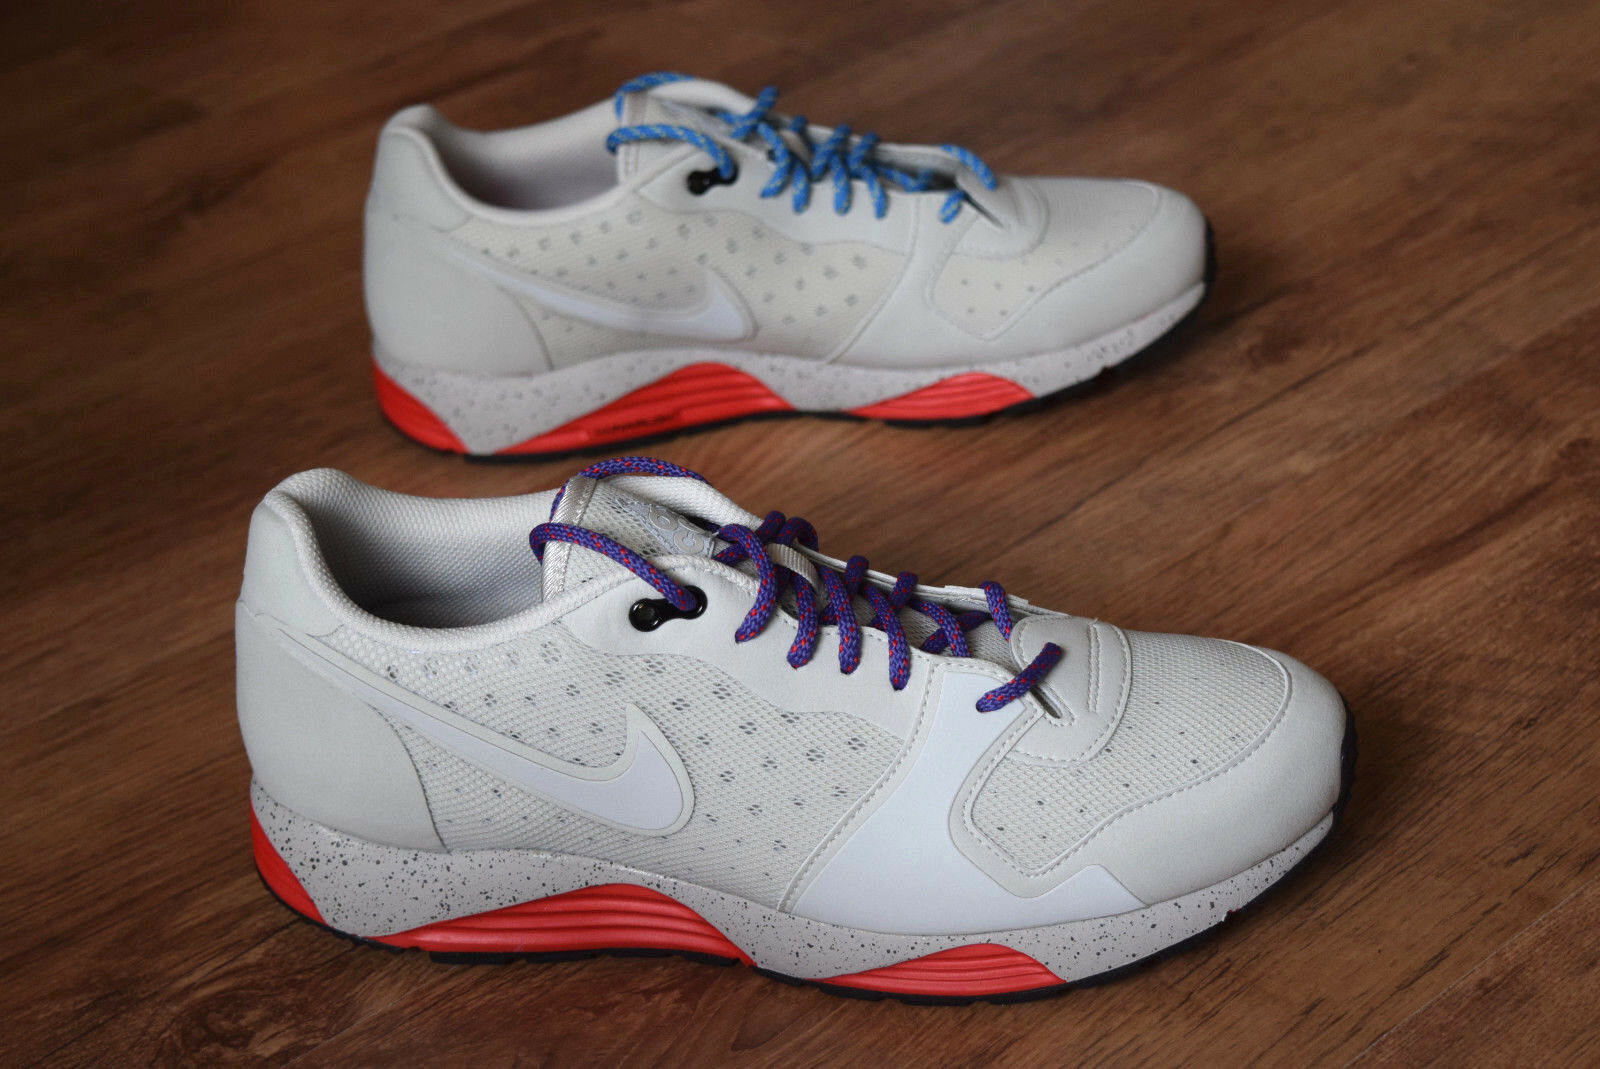 Nike Lunar Vengeance Terra +42 43 44 44,5 Dead Stock 429860 001 Vortex Epic Acg